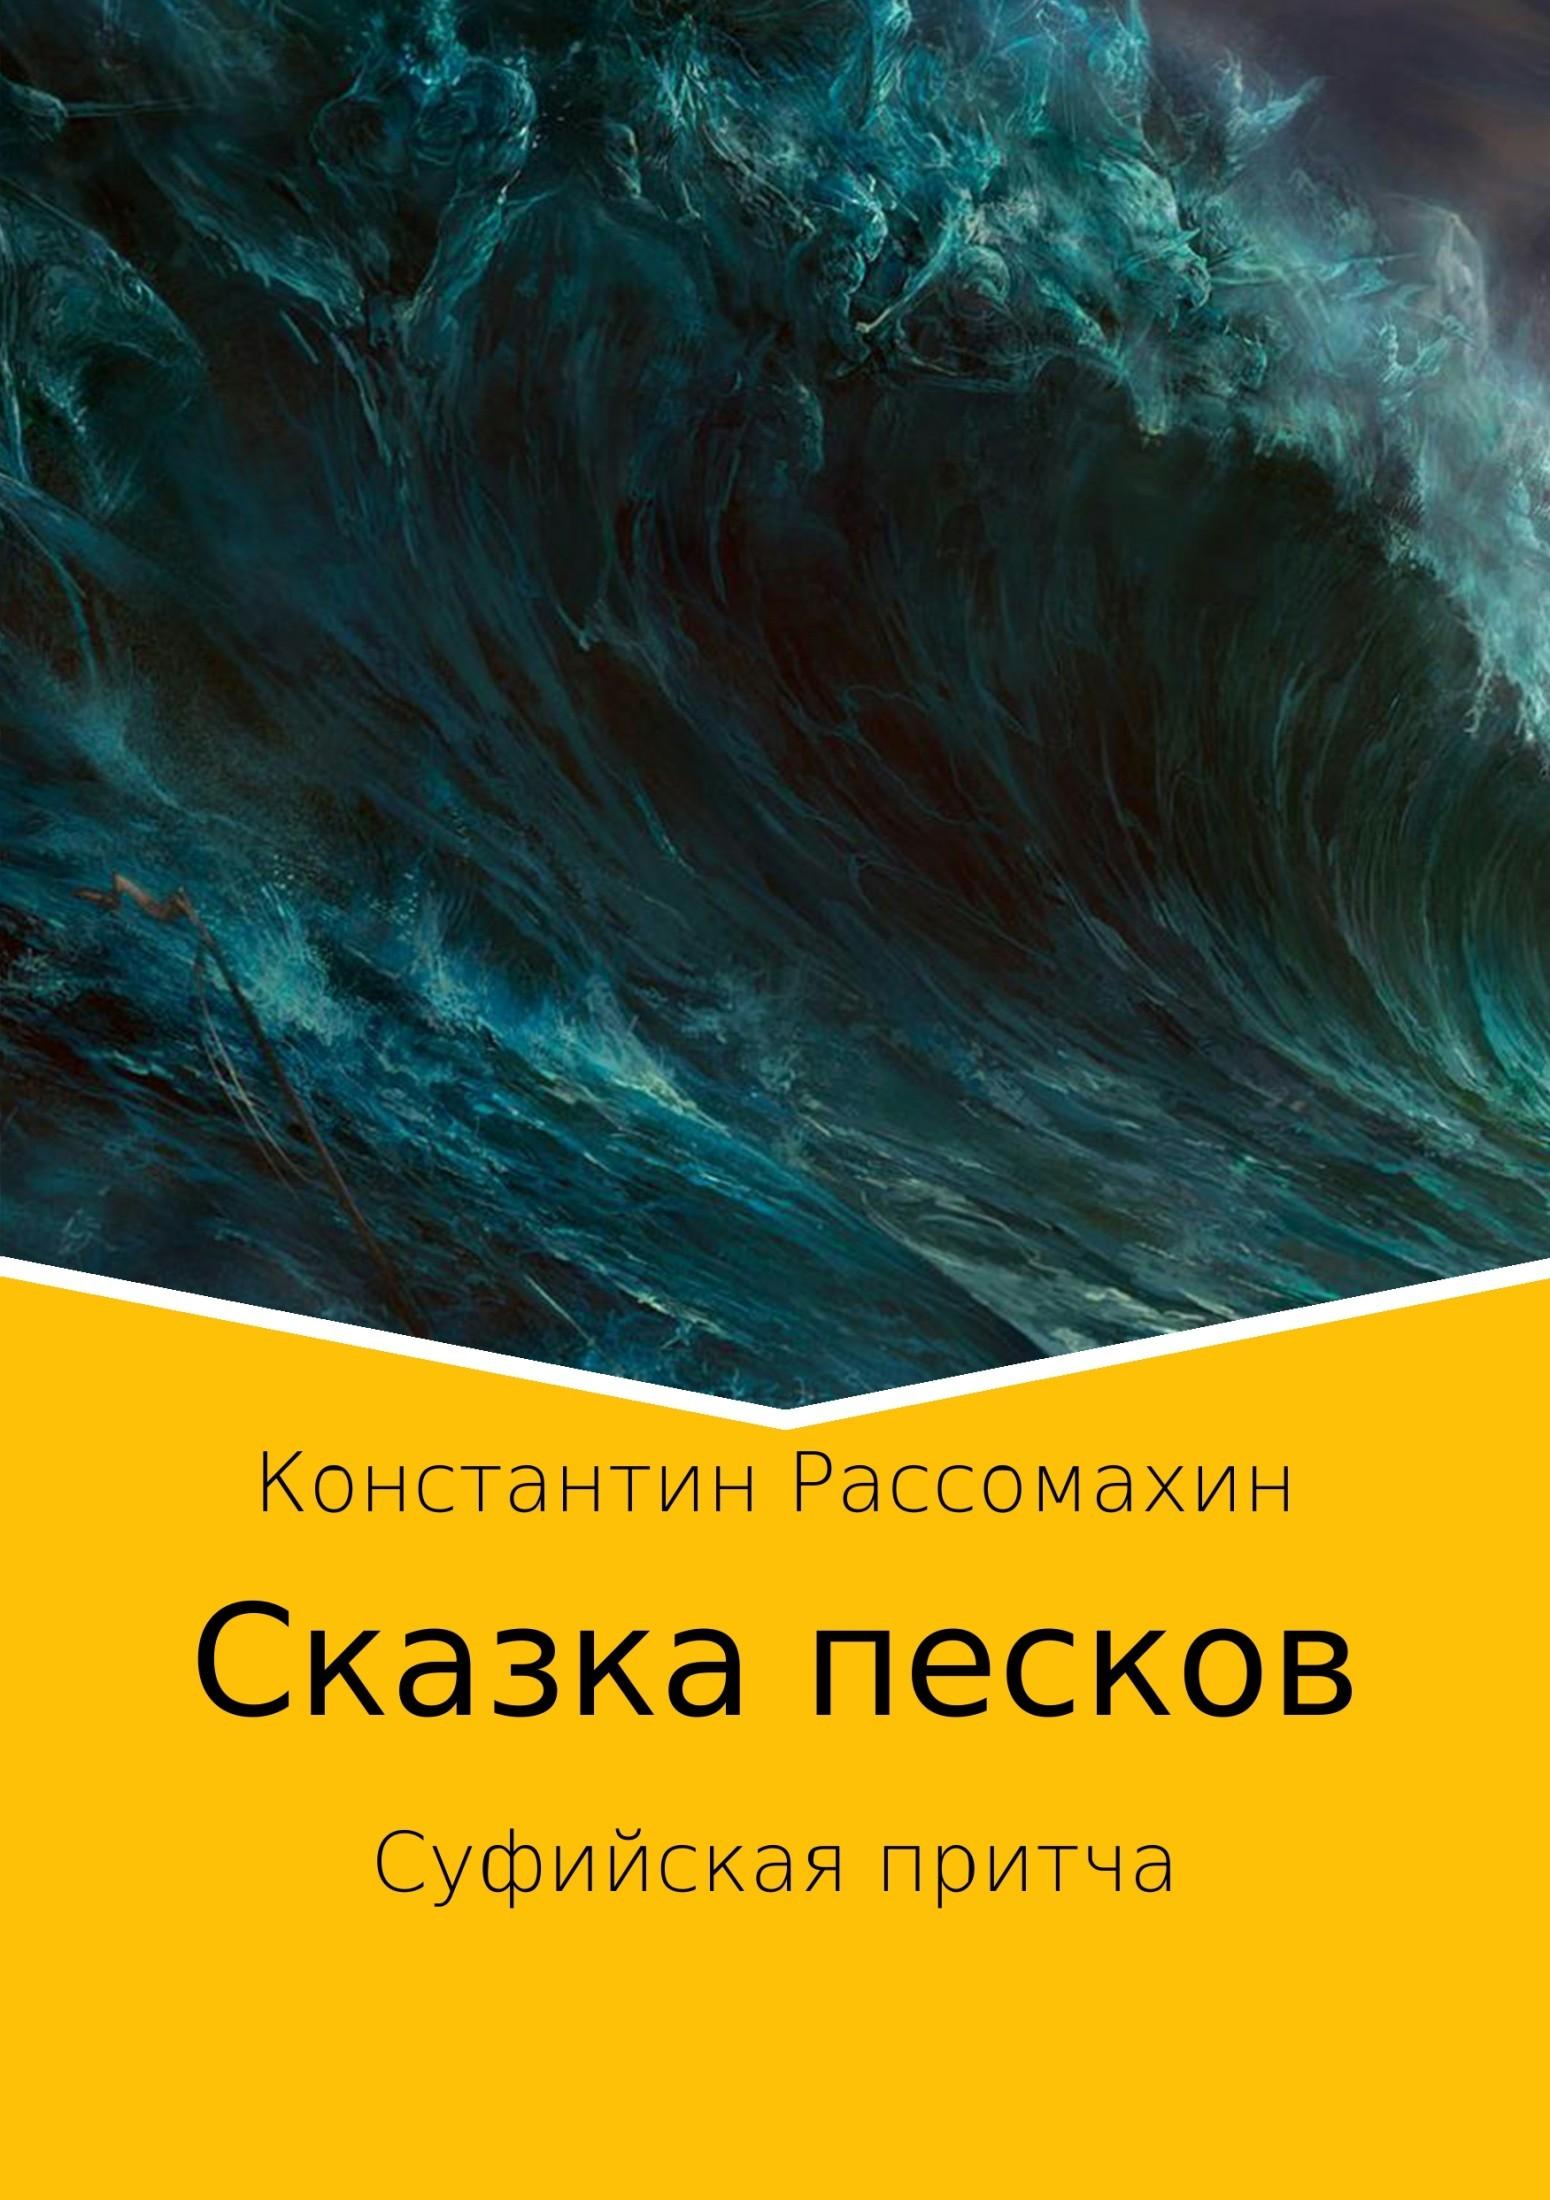 Константин Александрович Рассомахин Сказка песков. Суфийская притча цена в Москве и Питере